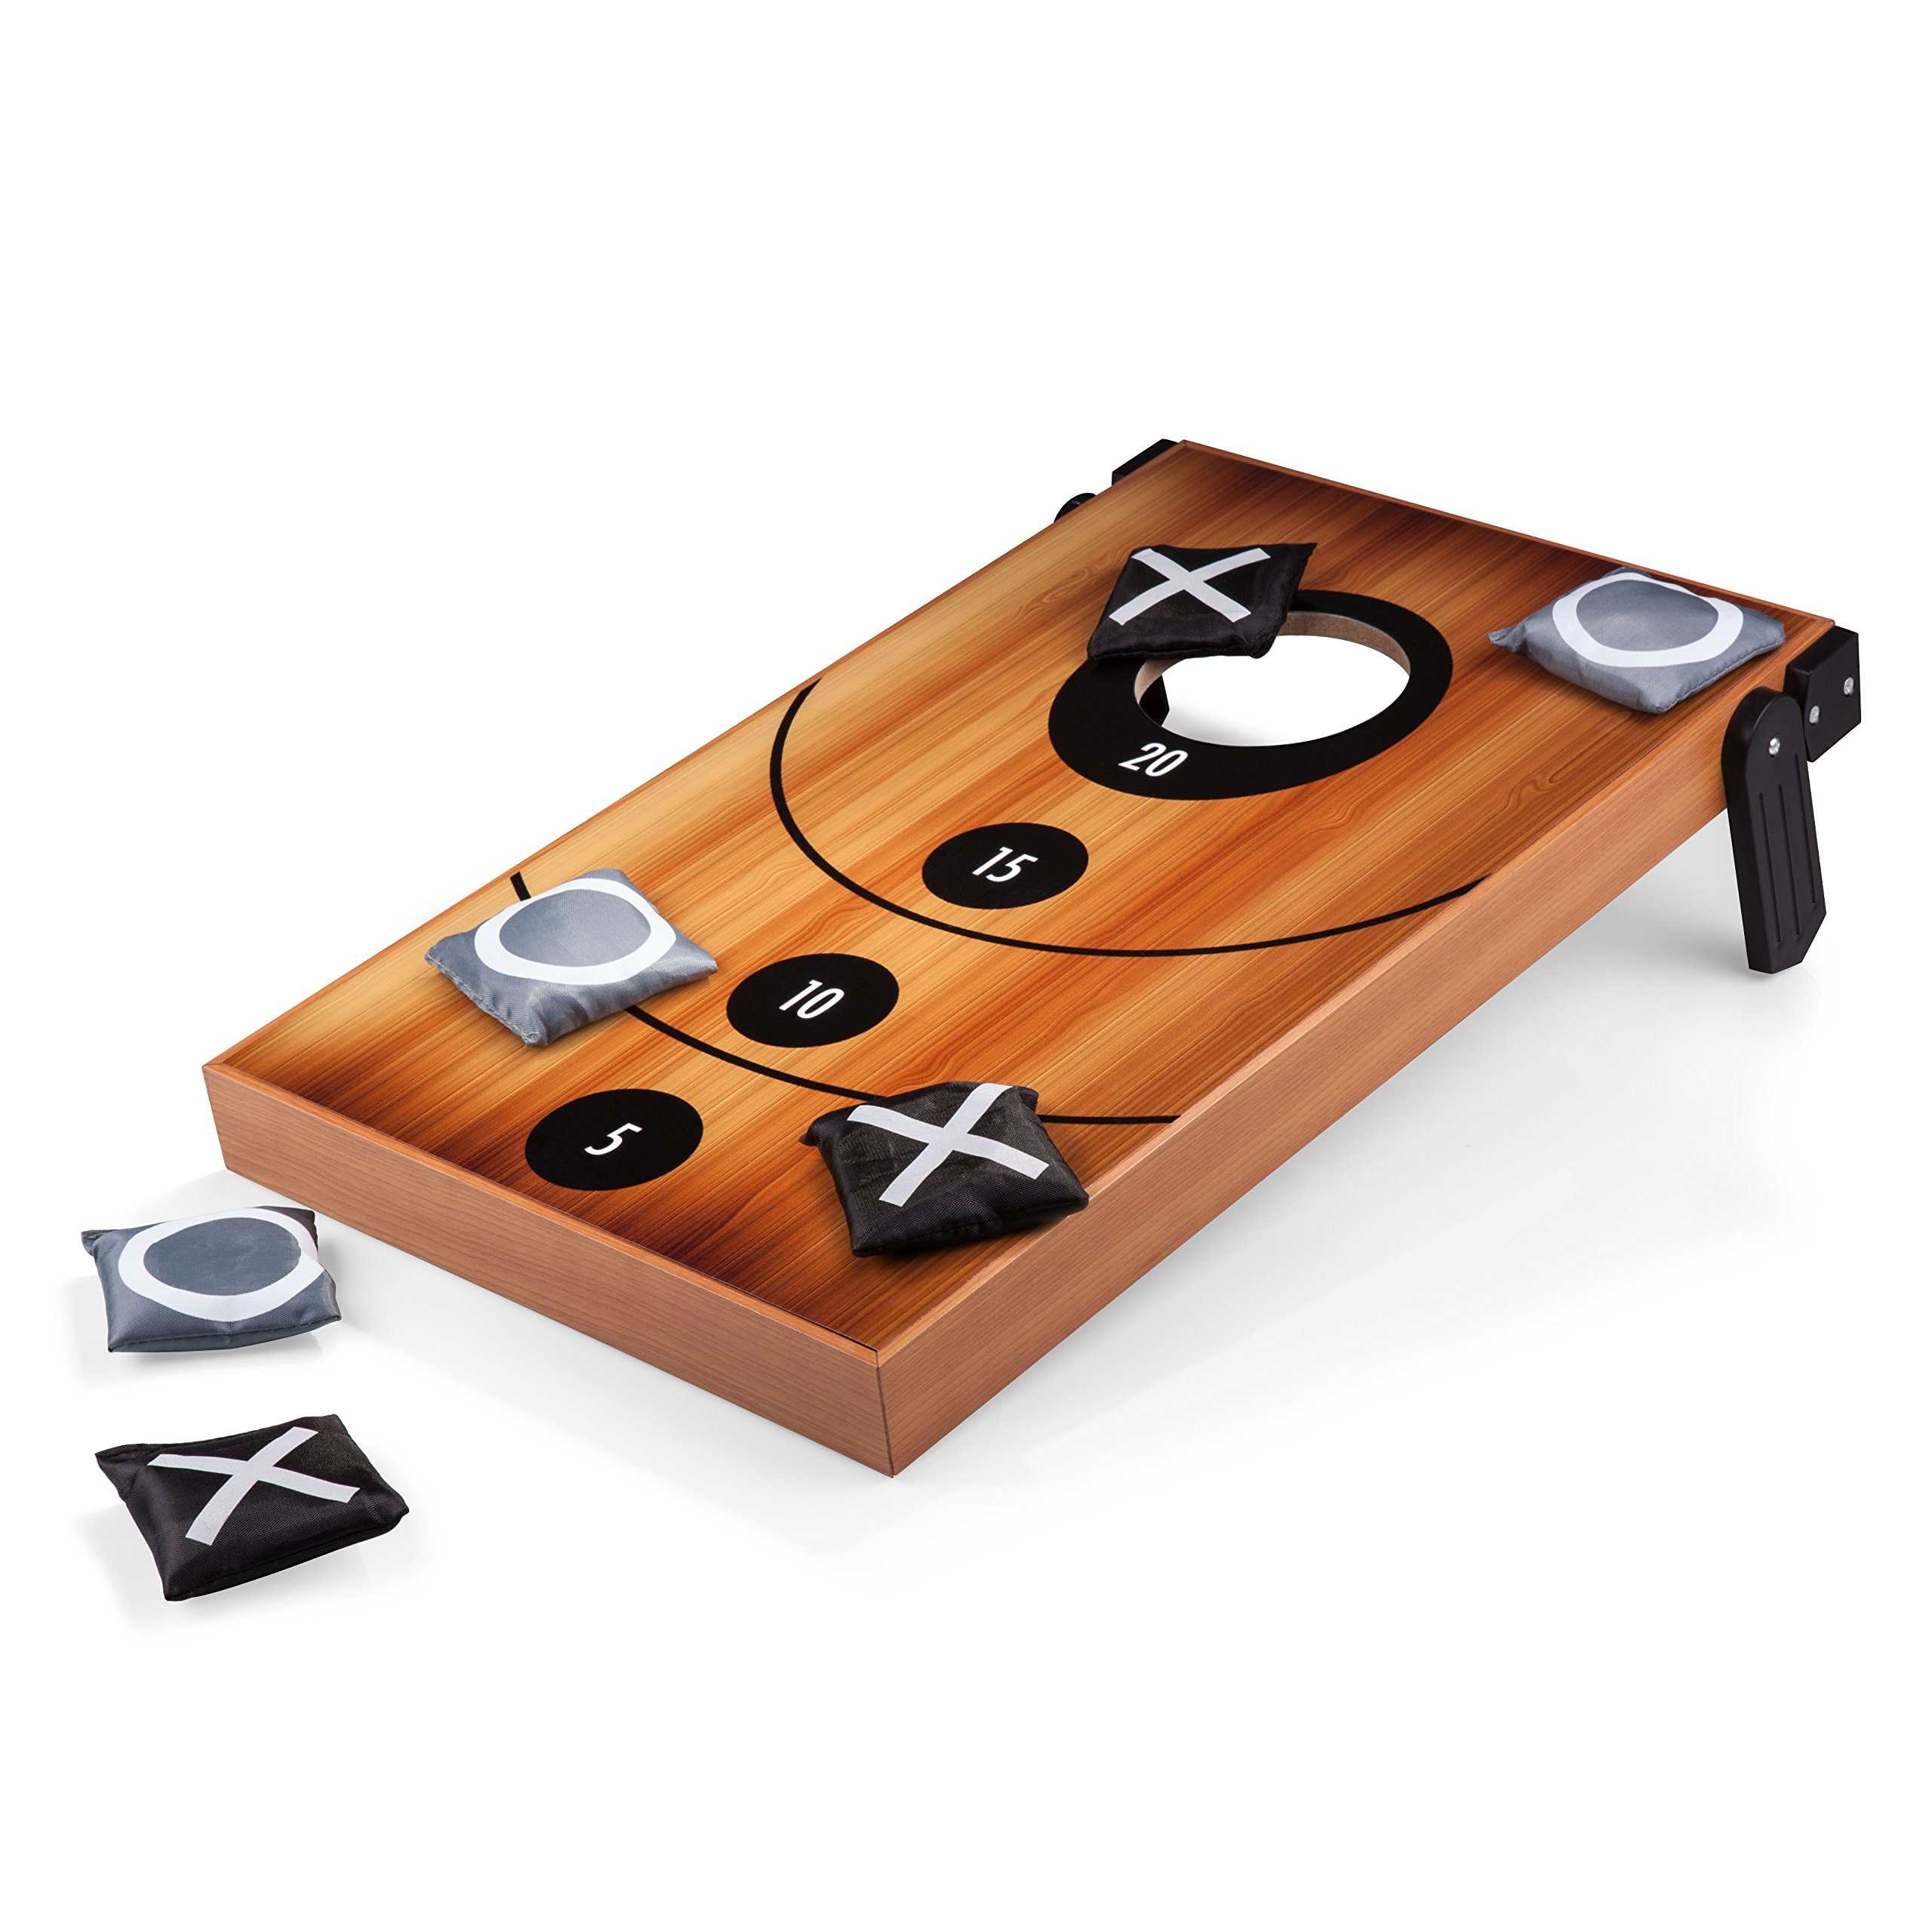 ONIVA - a Picnic Time brand Mini Bean Bag Throw Game Set